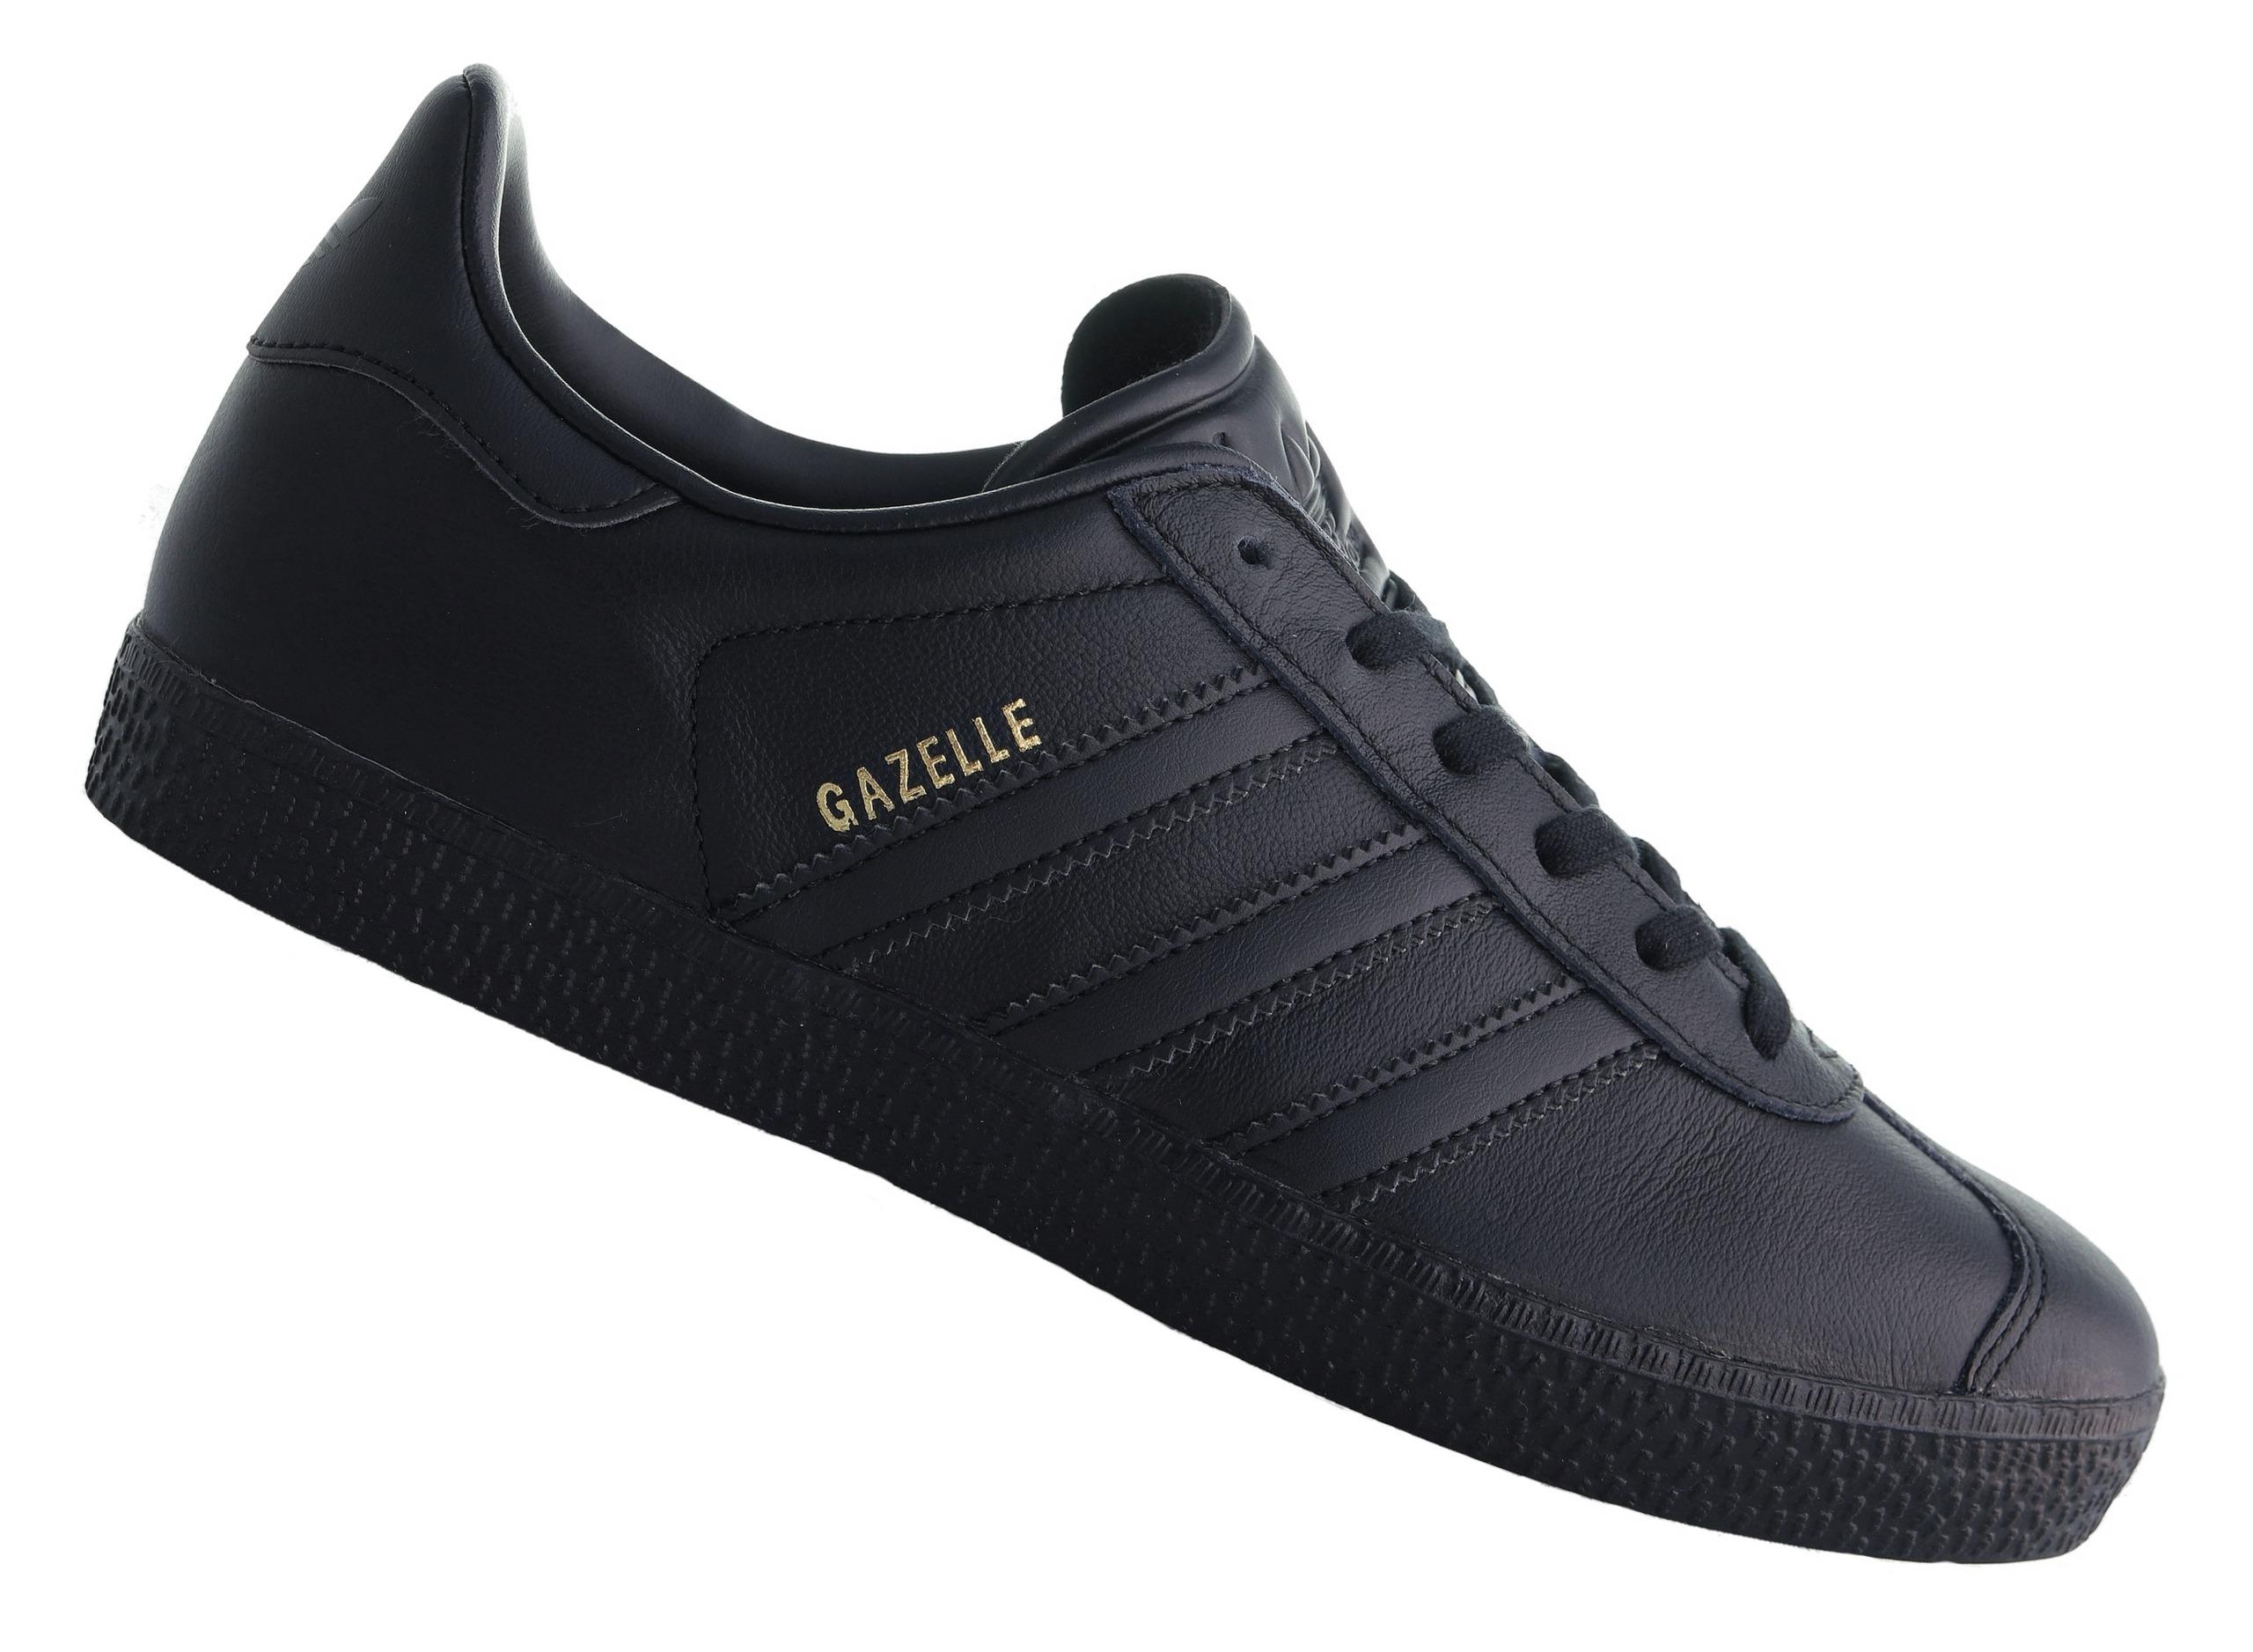 online retailer fea47 88abe adidas Originals Gazelle J BY9146 rozmiar 36 - 6850980385 - oficjalne  archiwum allegro